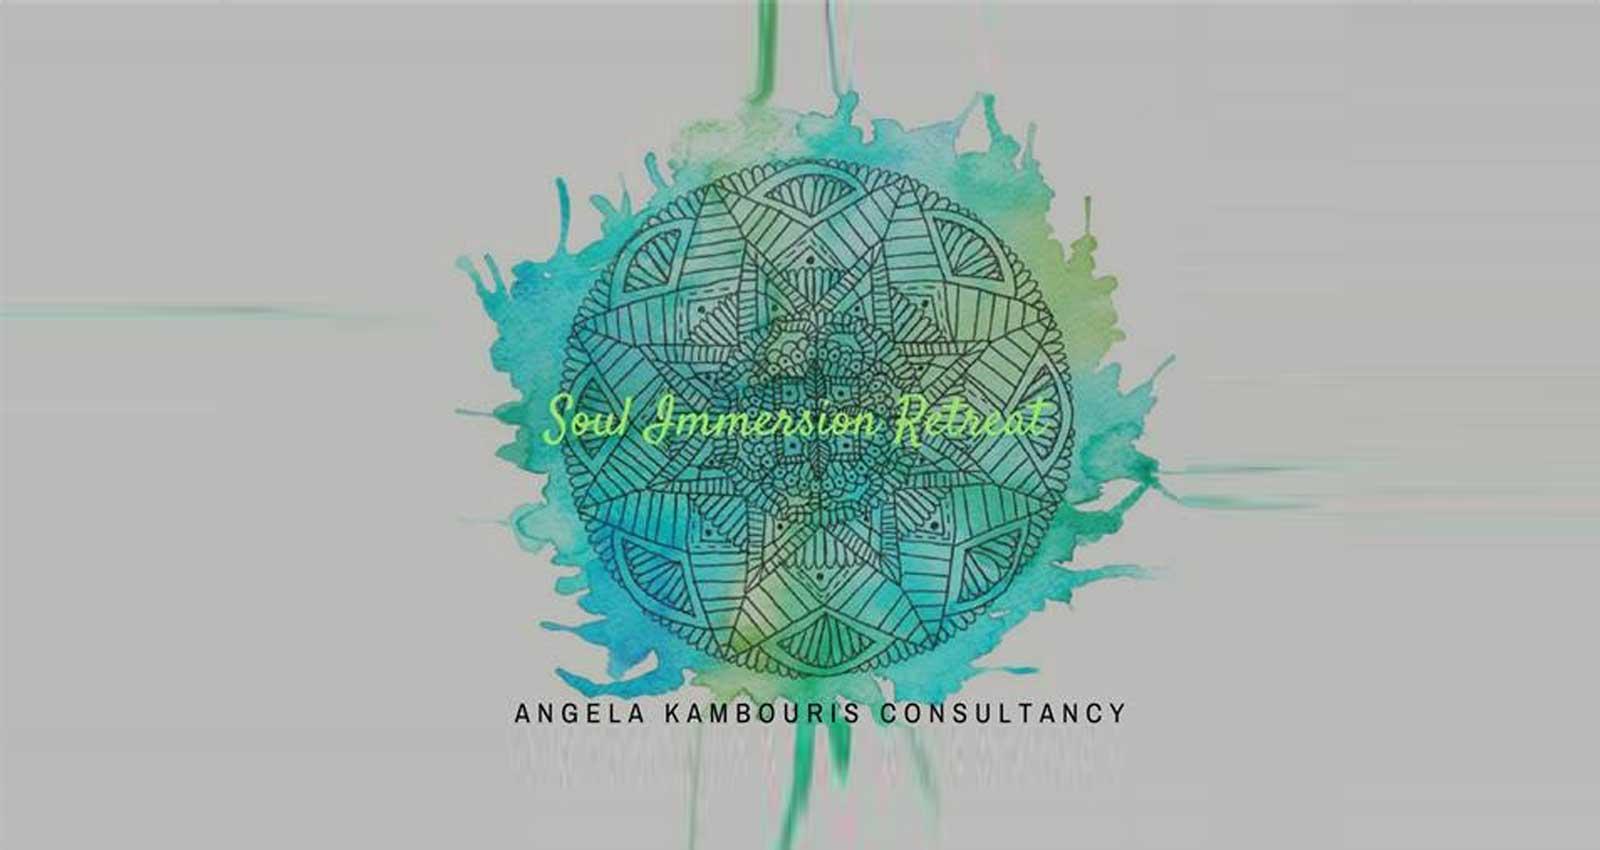 soul immersion retreatment banner full